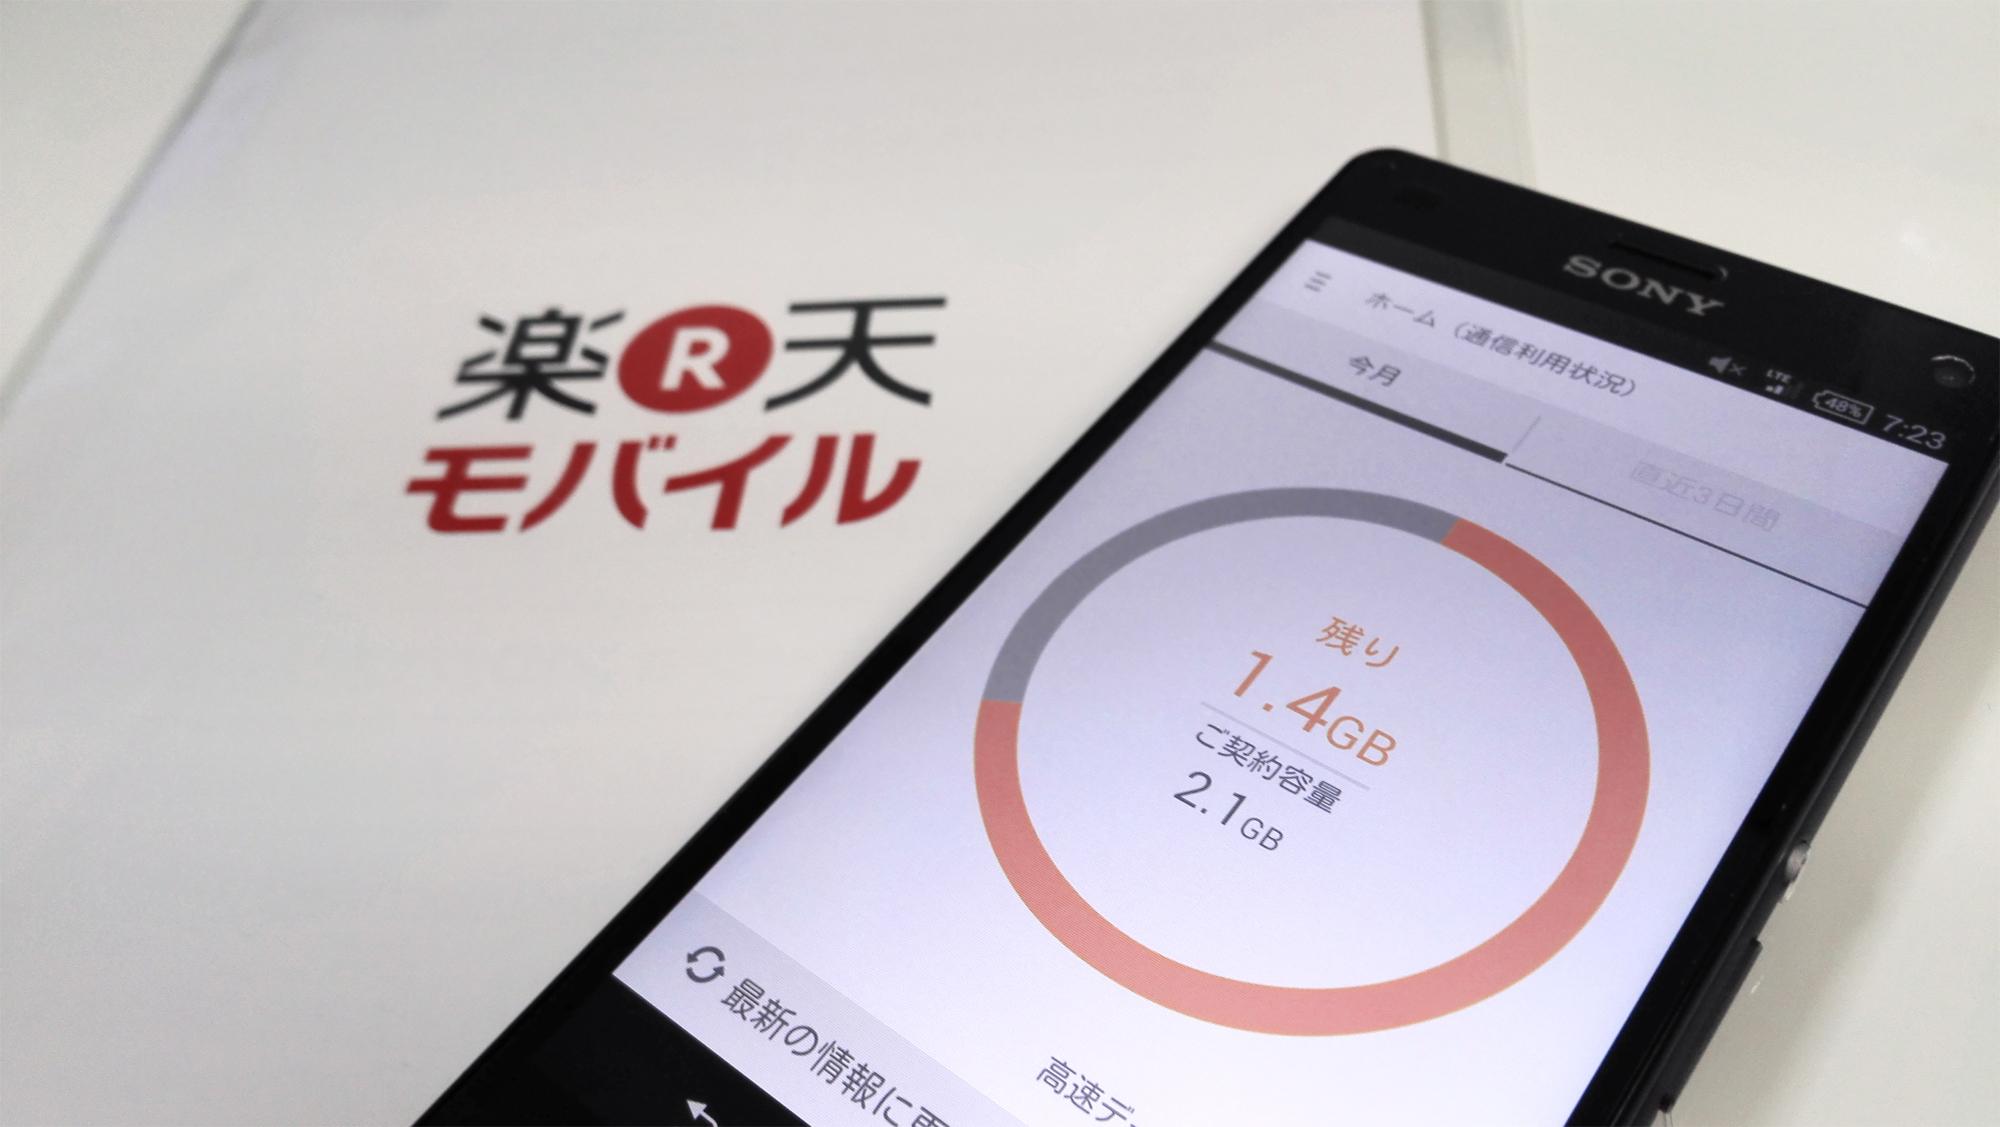 rakuten-mobile_app_20150306